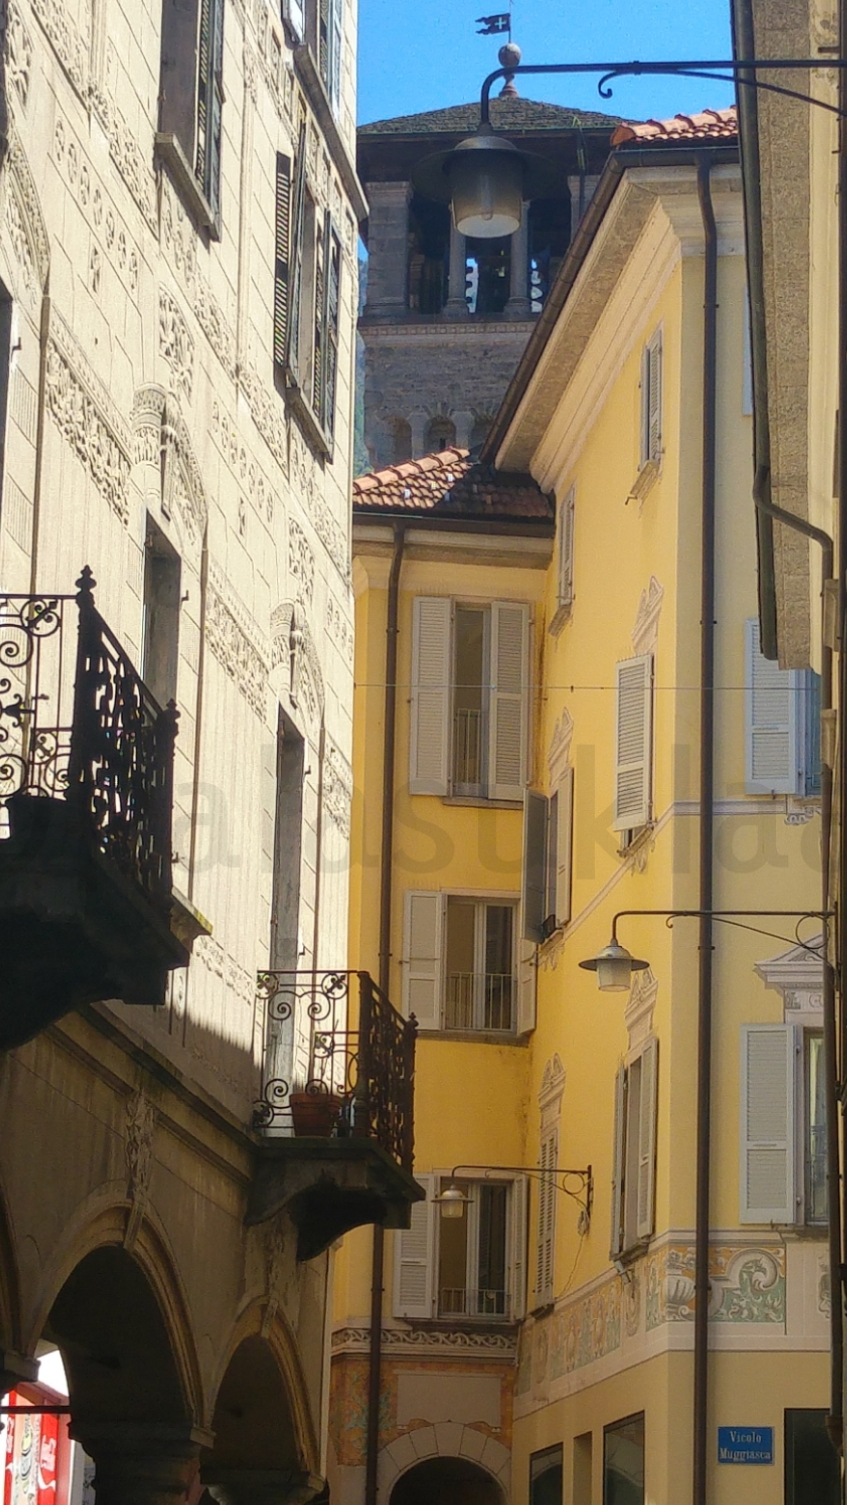 bellinzona arkkitehtuuri